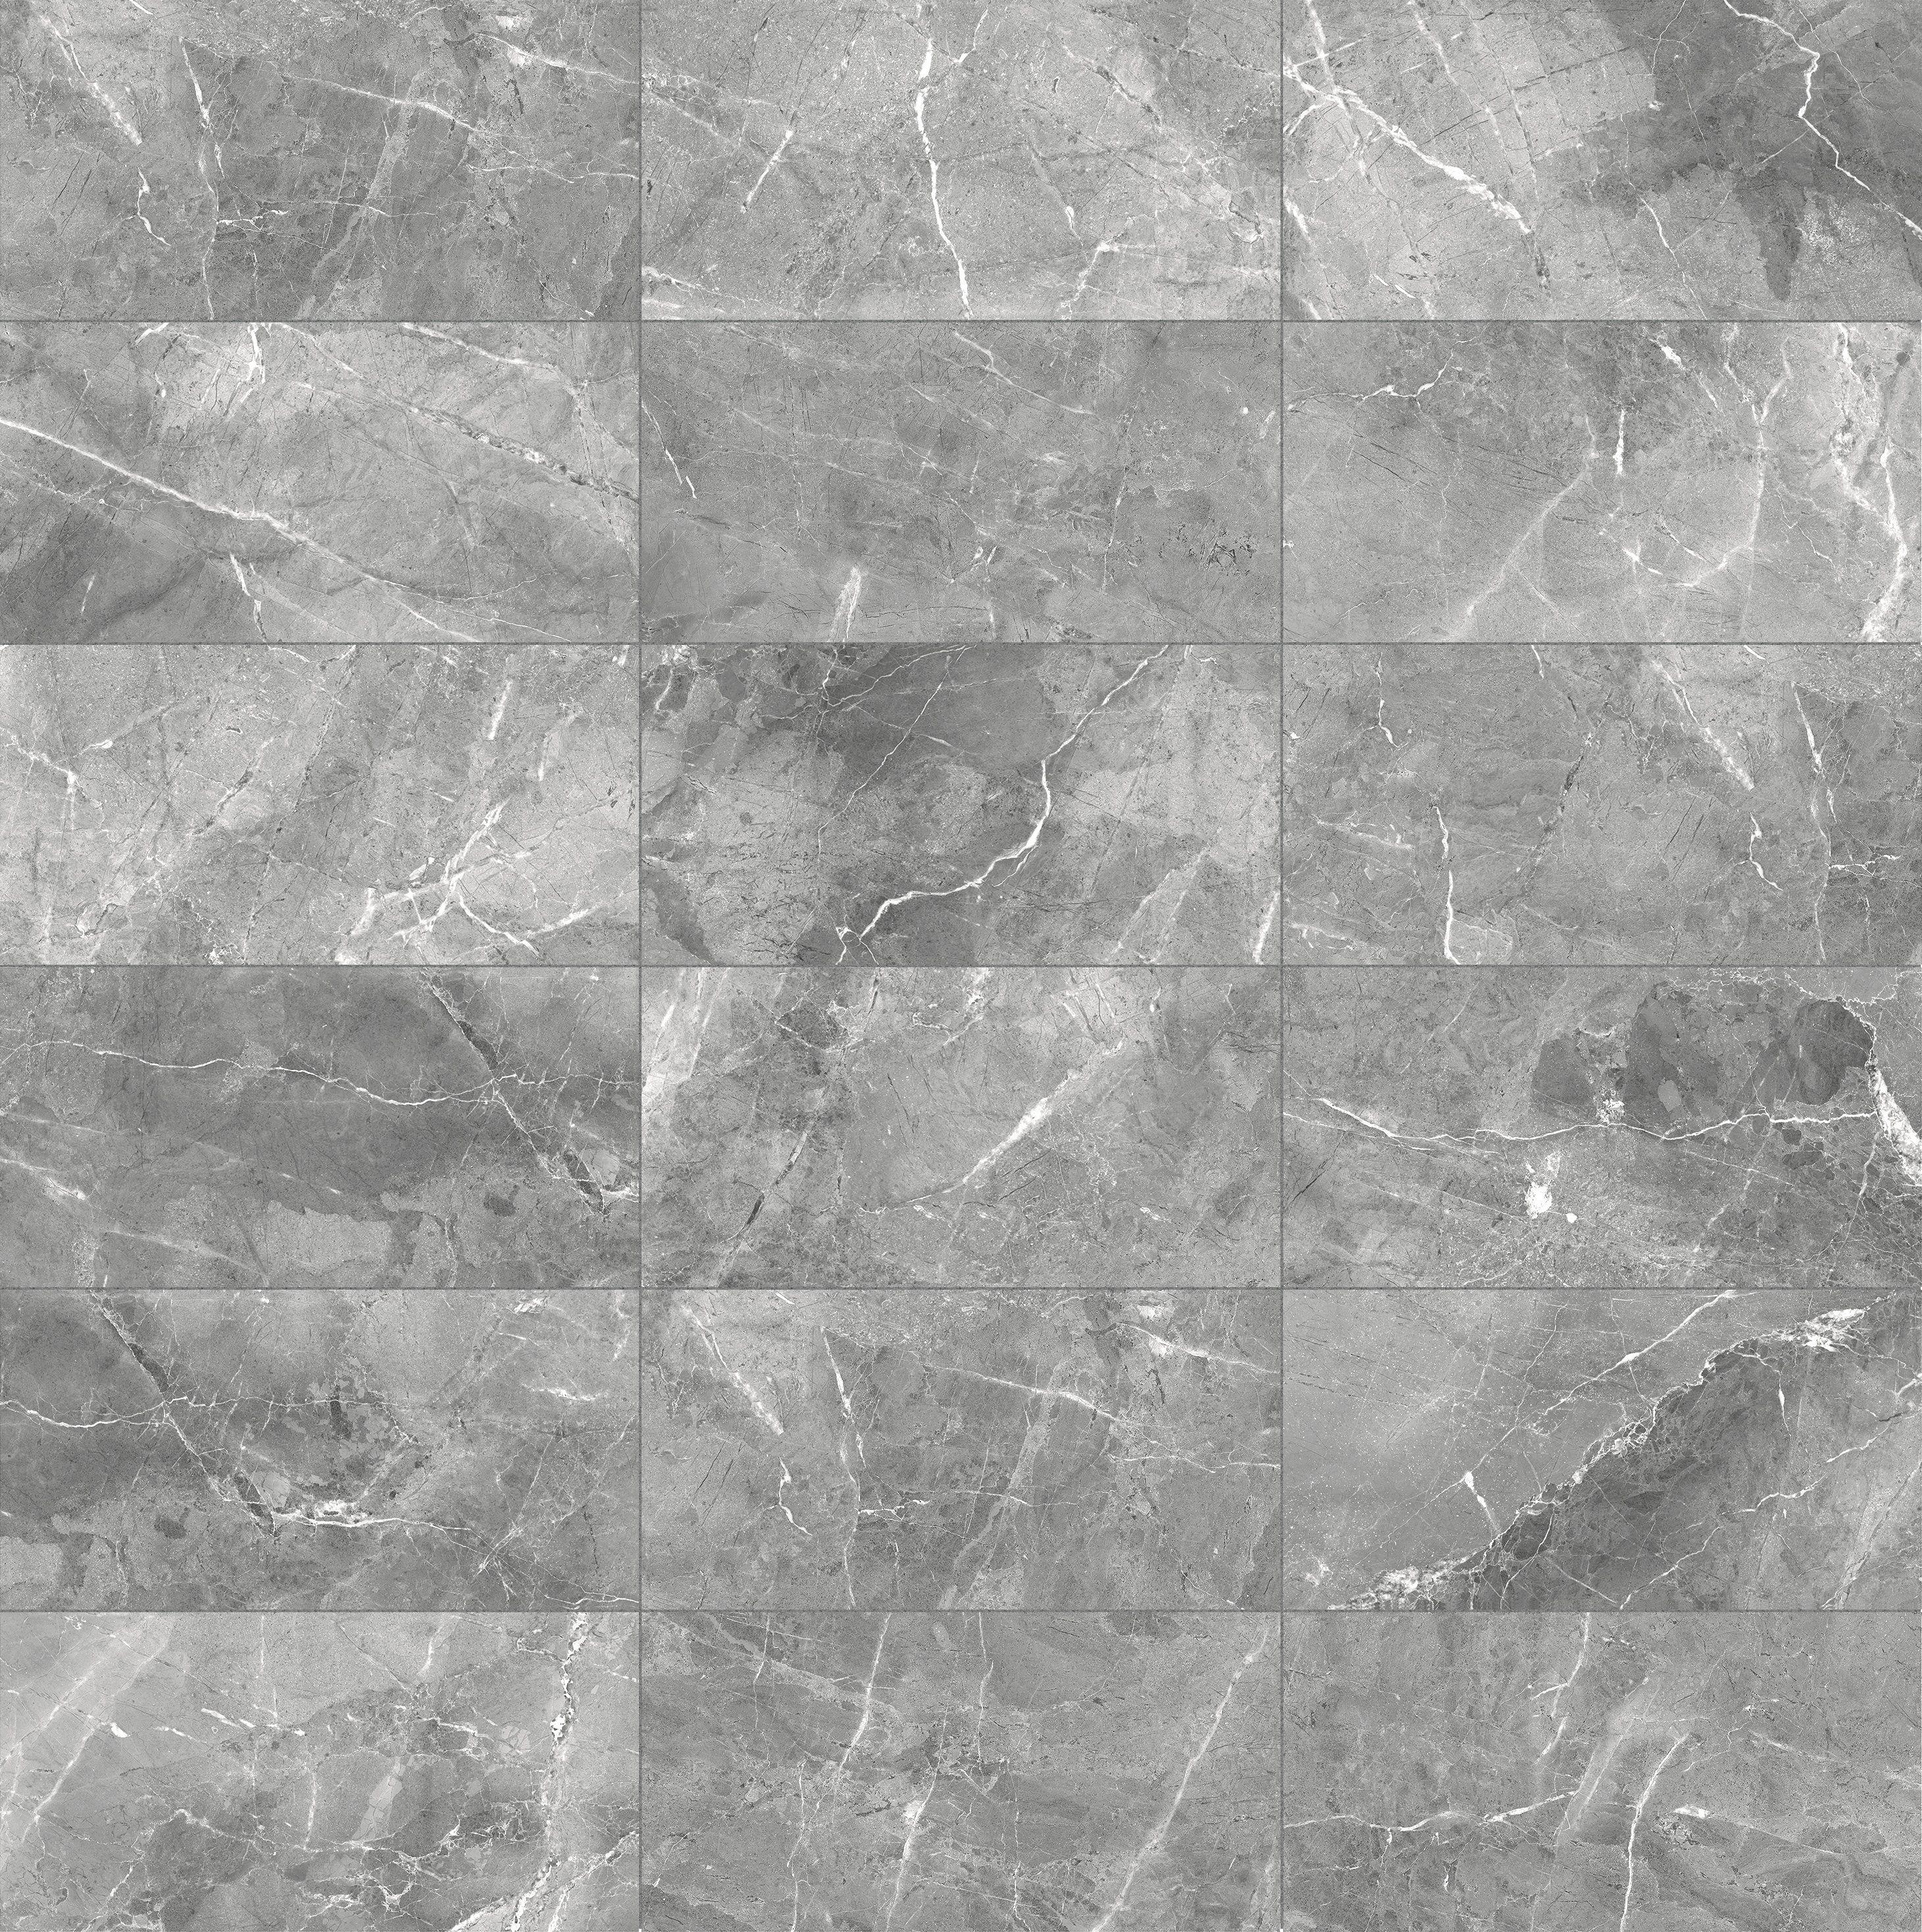 Regency Carbon 12x24 Variation Tiles Texture Brick Texture Marble Texture